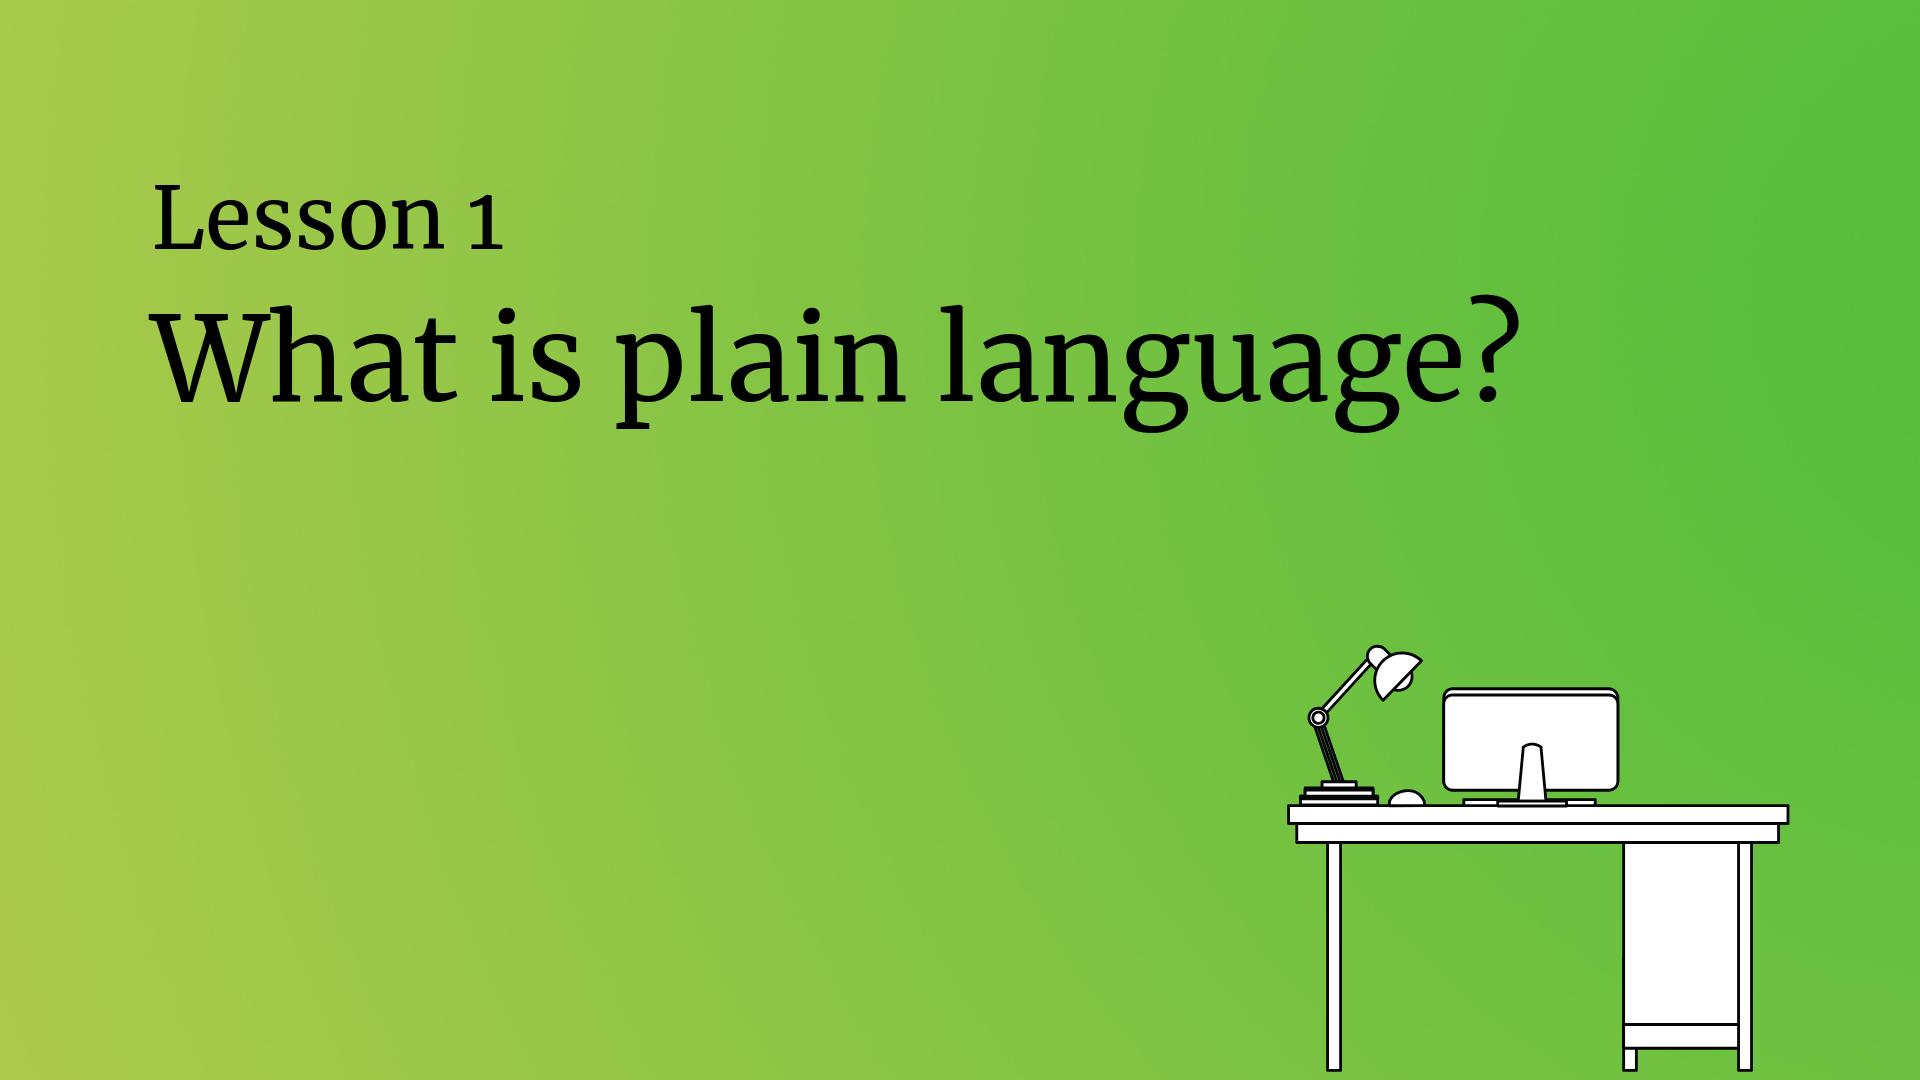 What is plain language?